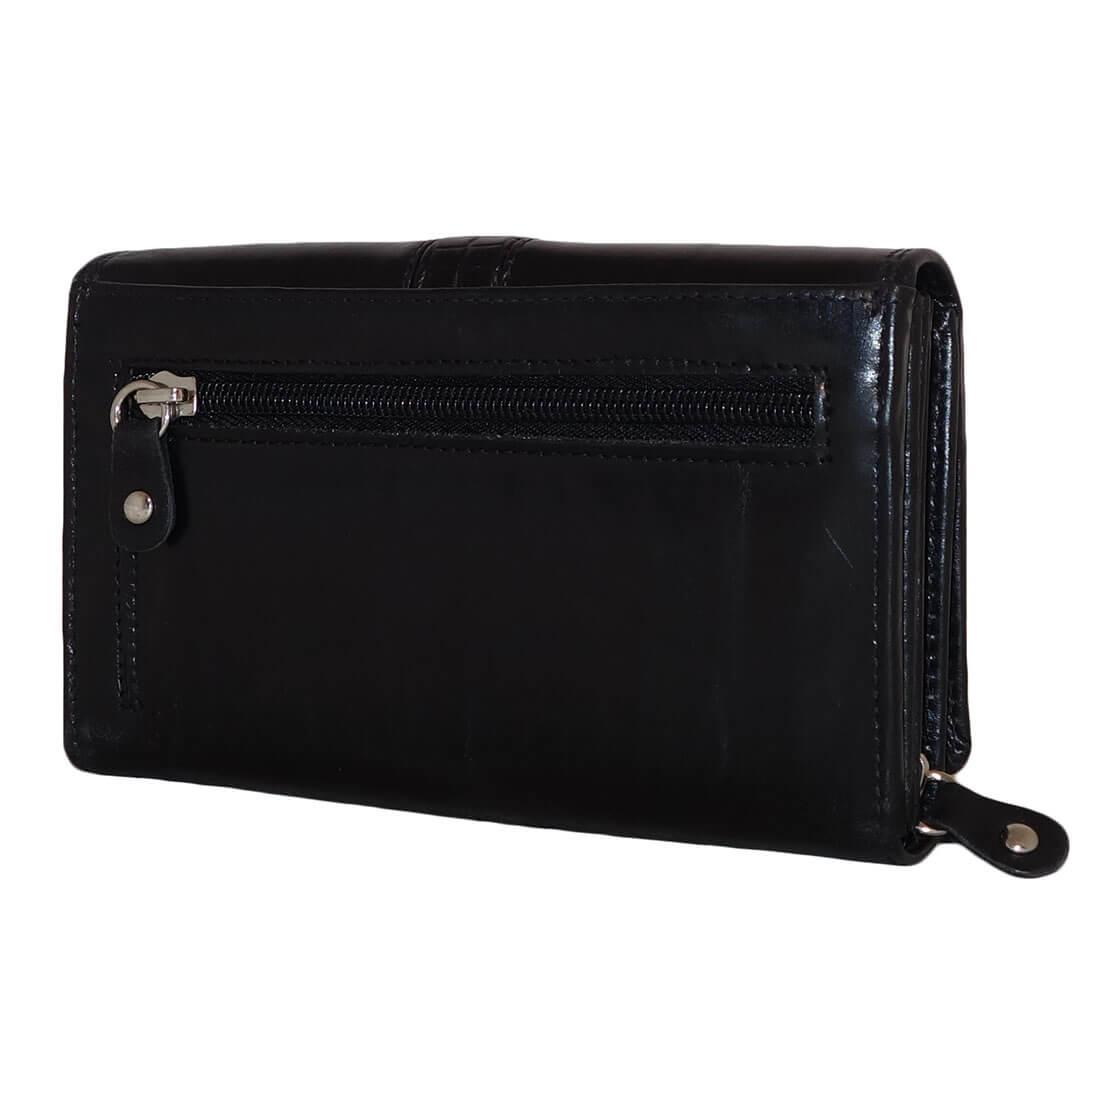 c3bb6fd149a leather_design_portemonnee_croco_zwart_sh_10_c_2  leather_design_portemonnee_croco_zwart_sh_10_c_3  leather_design_portemonnee_croco_zwart_sh_10_c_4 ...